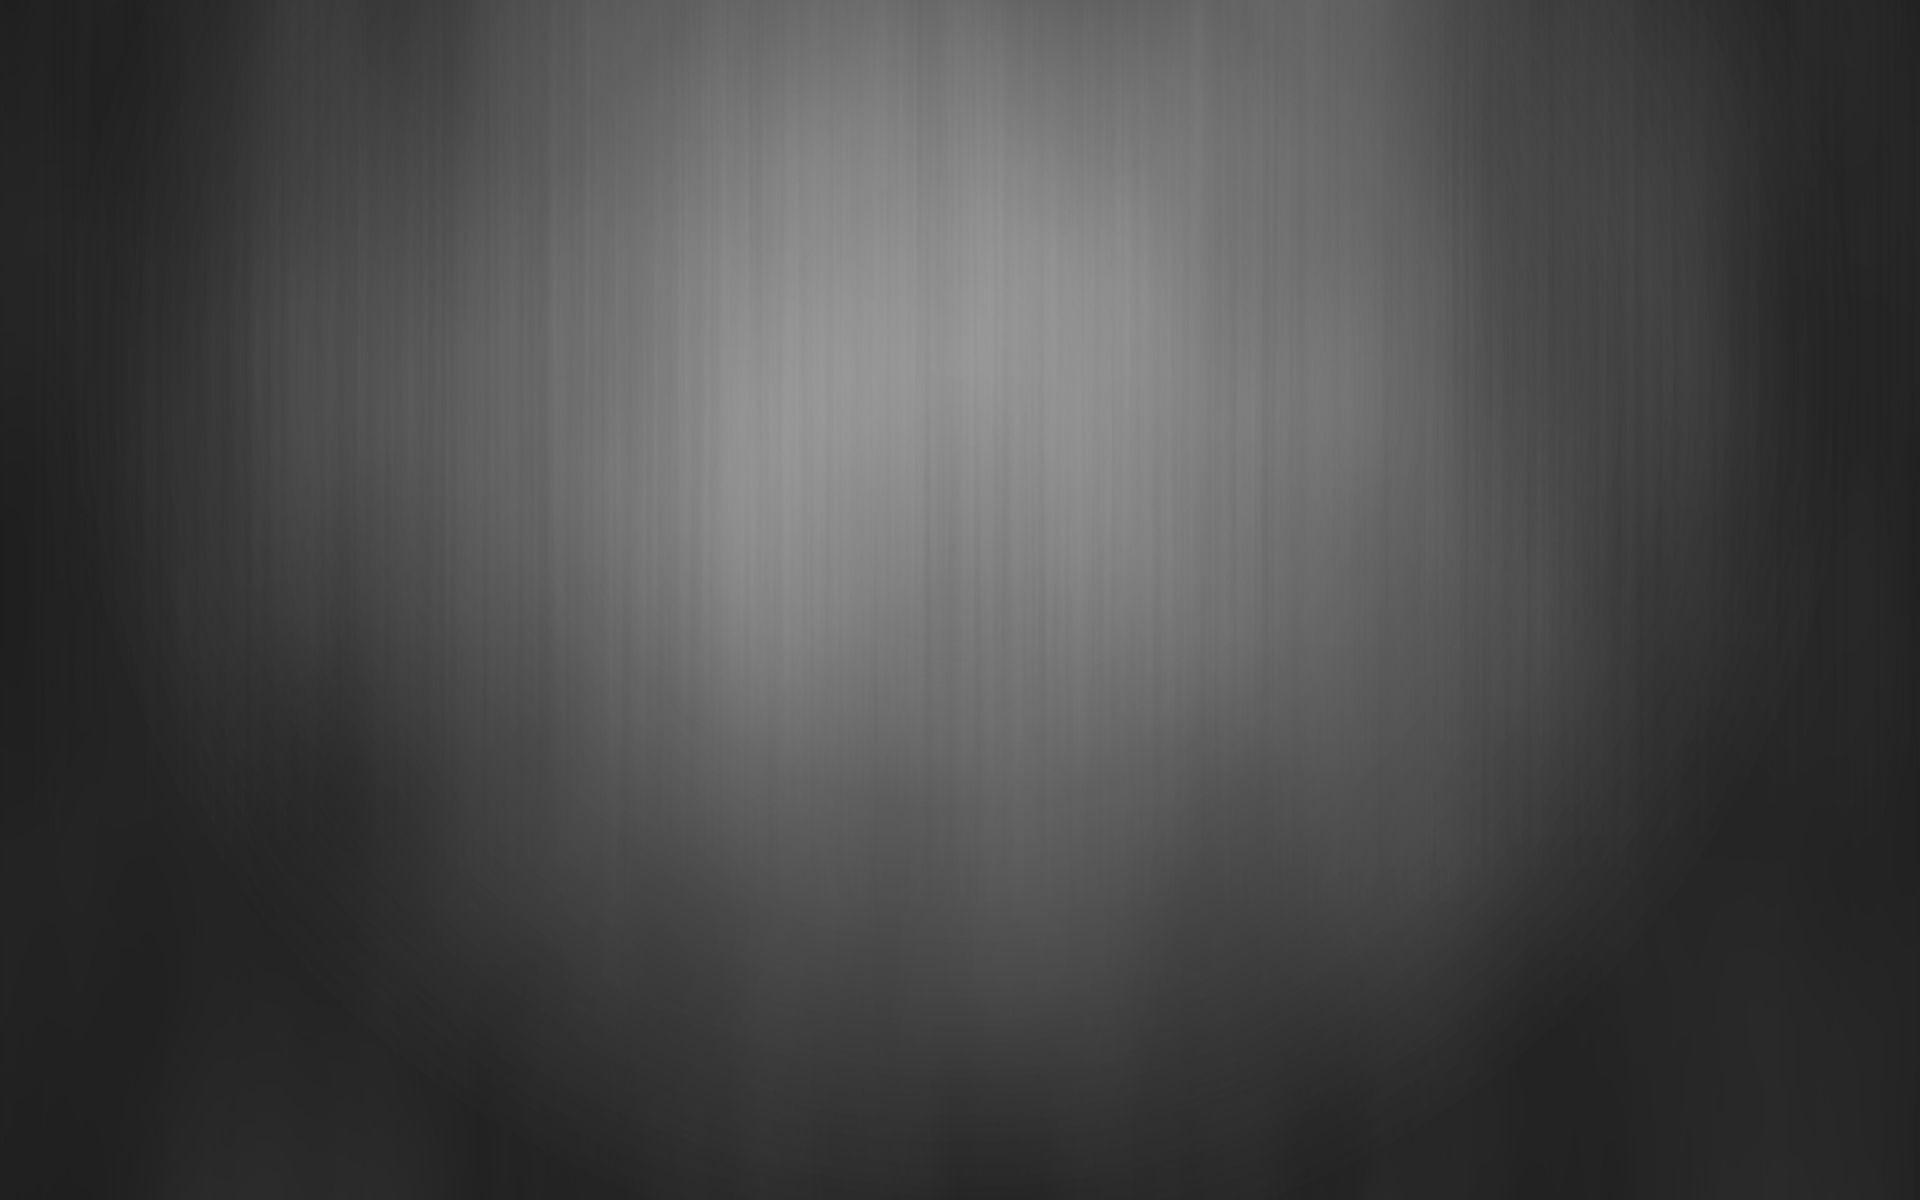 black background 1920x1200 - photo #6